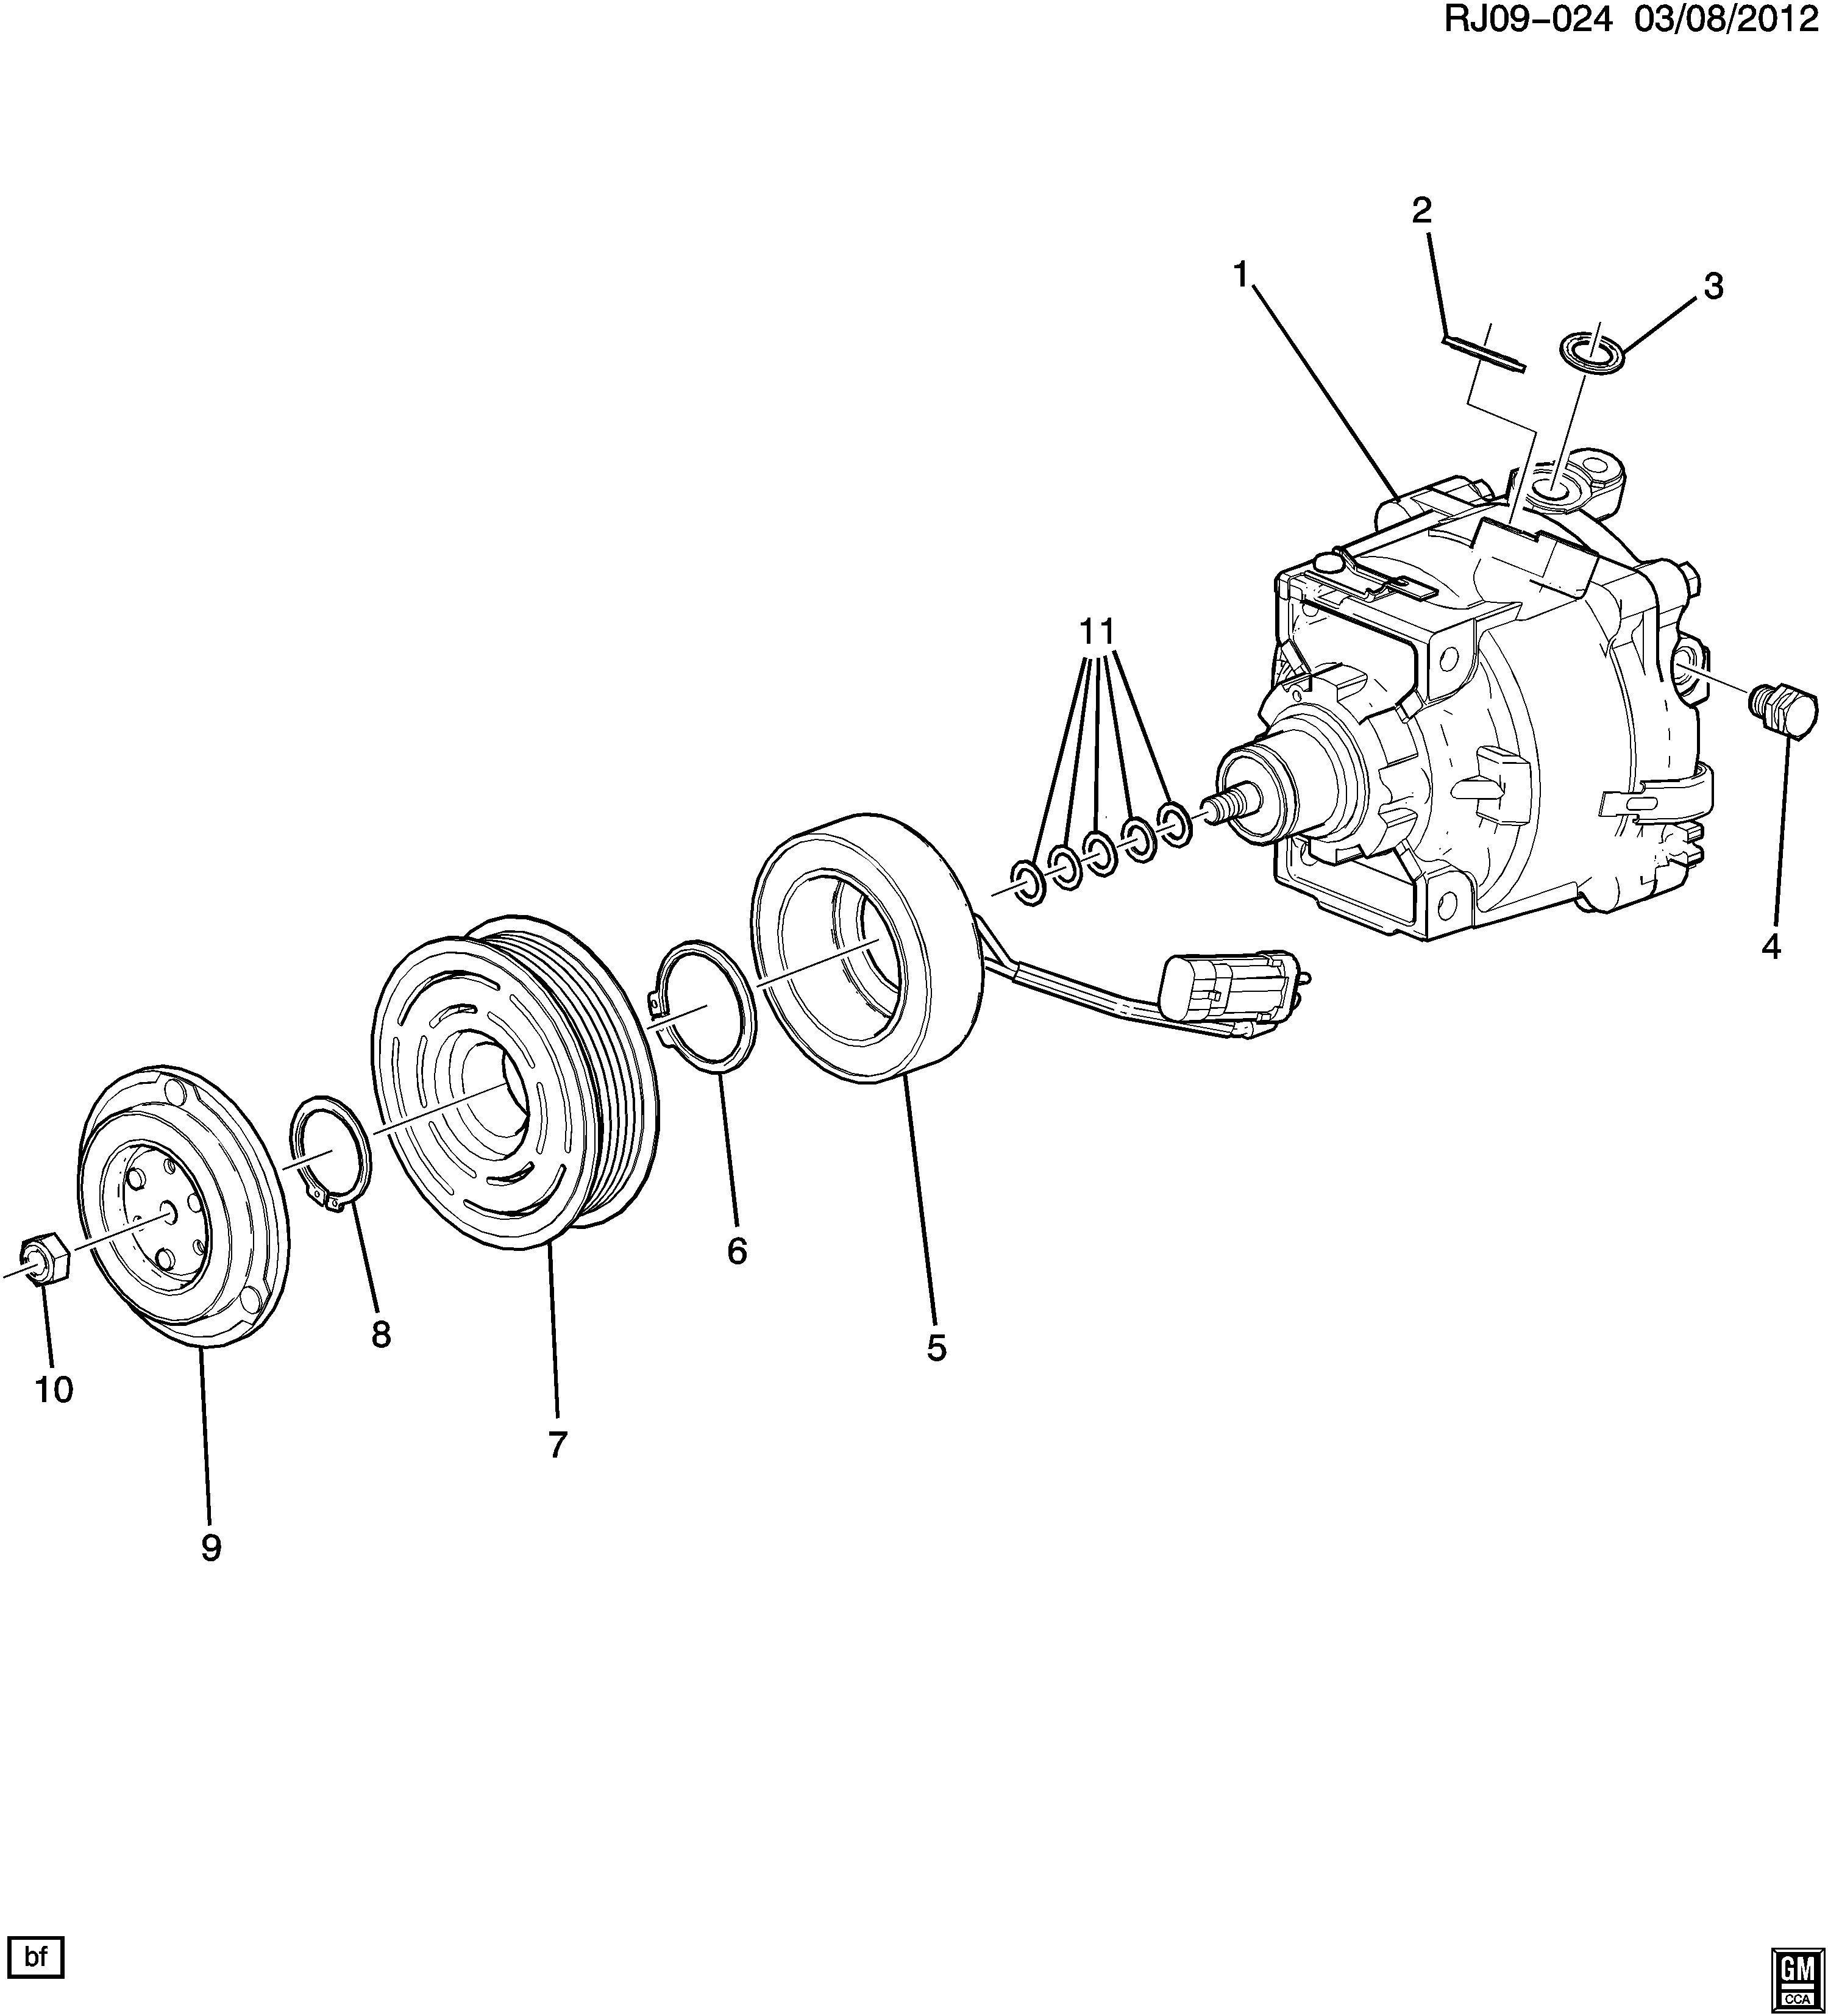 2013 Chevrolet Sonic LTZ 4DR Compressor kit. Air